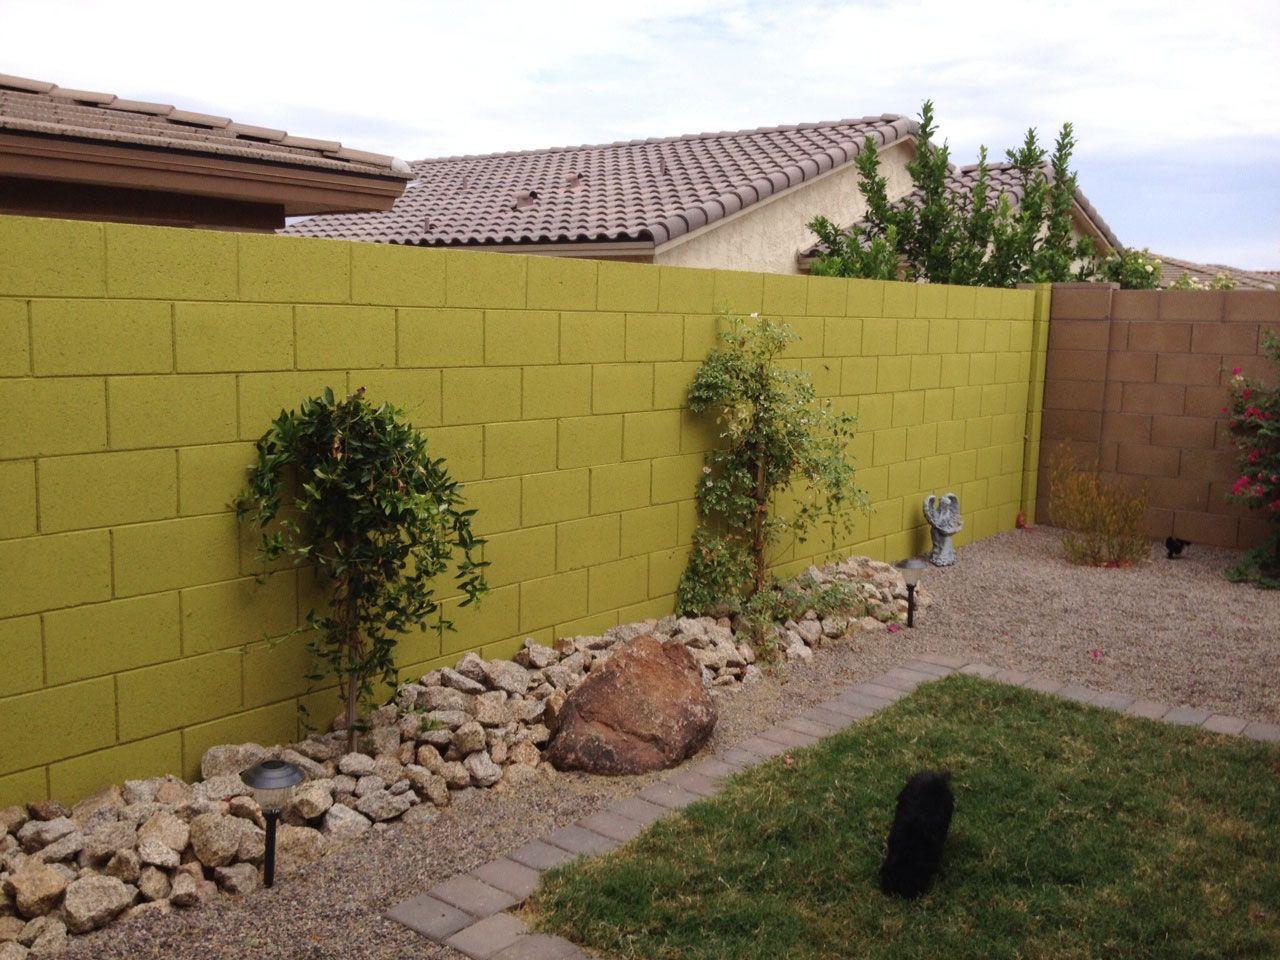 Garden Cinderblock Wall Paint Google Search Cinder Block Walls